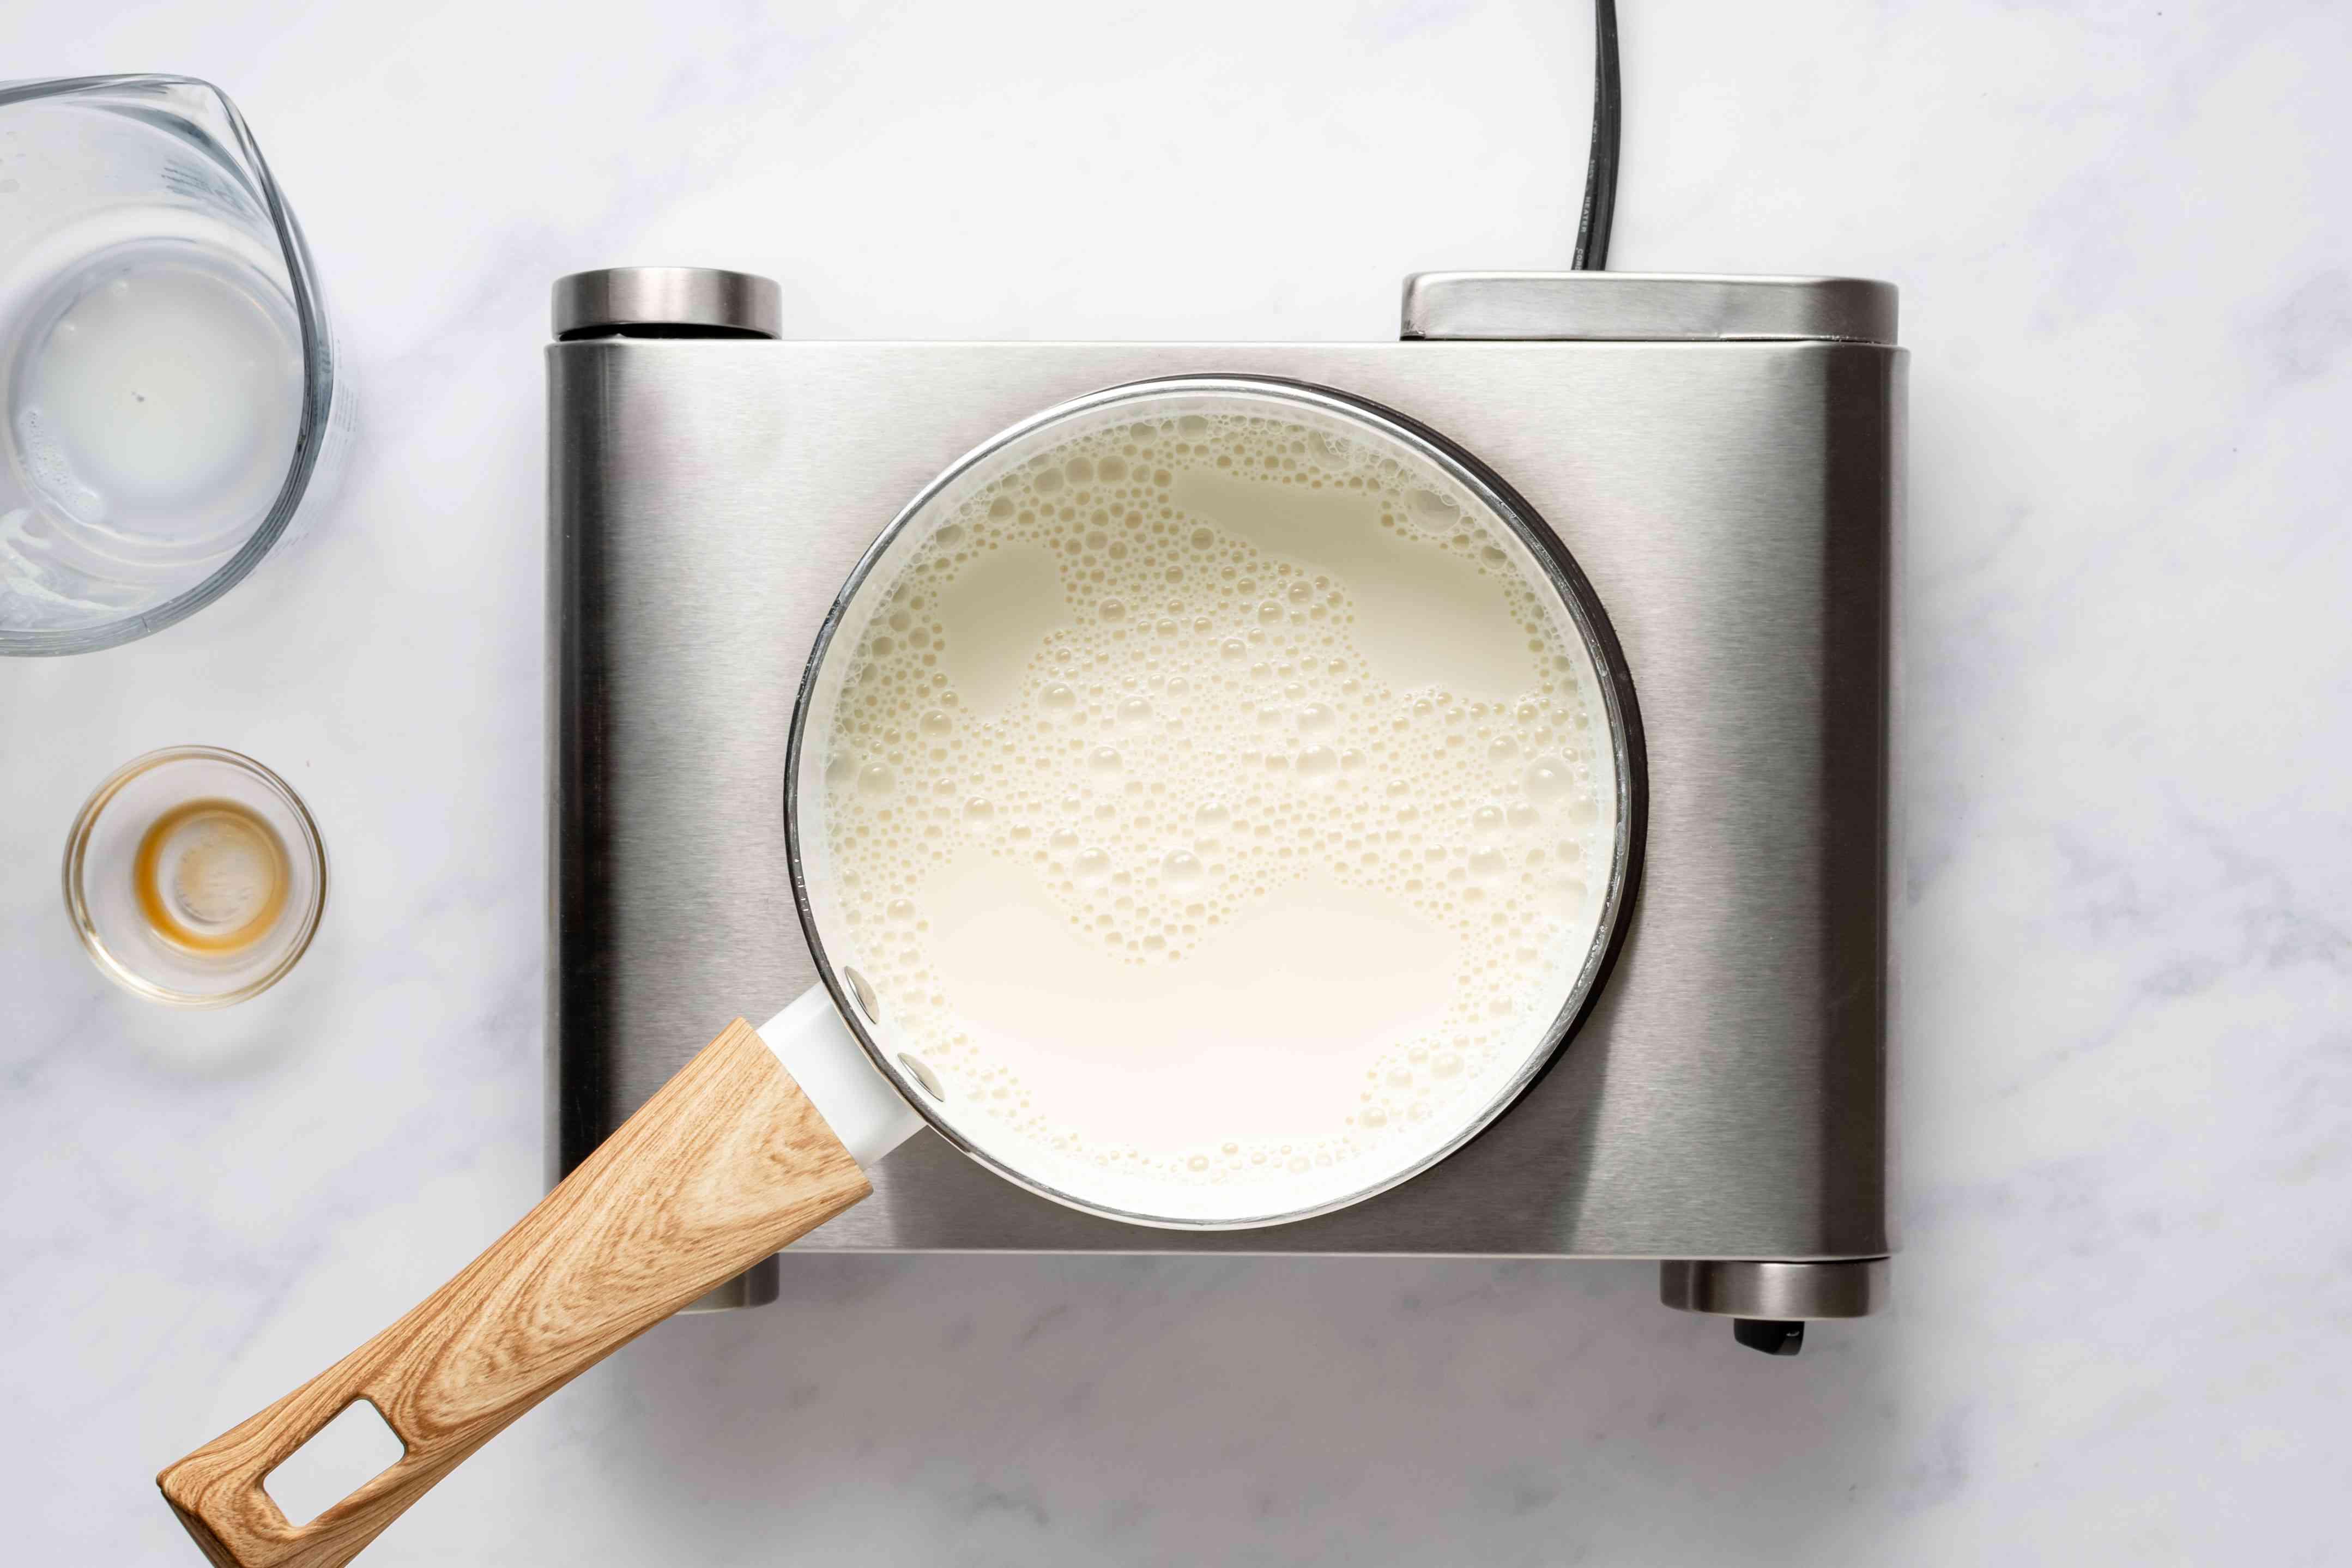 milk and vanilla in a saucepan